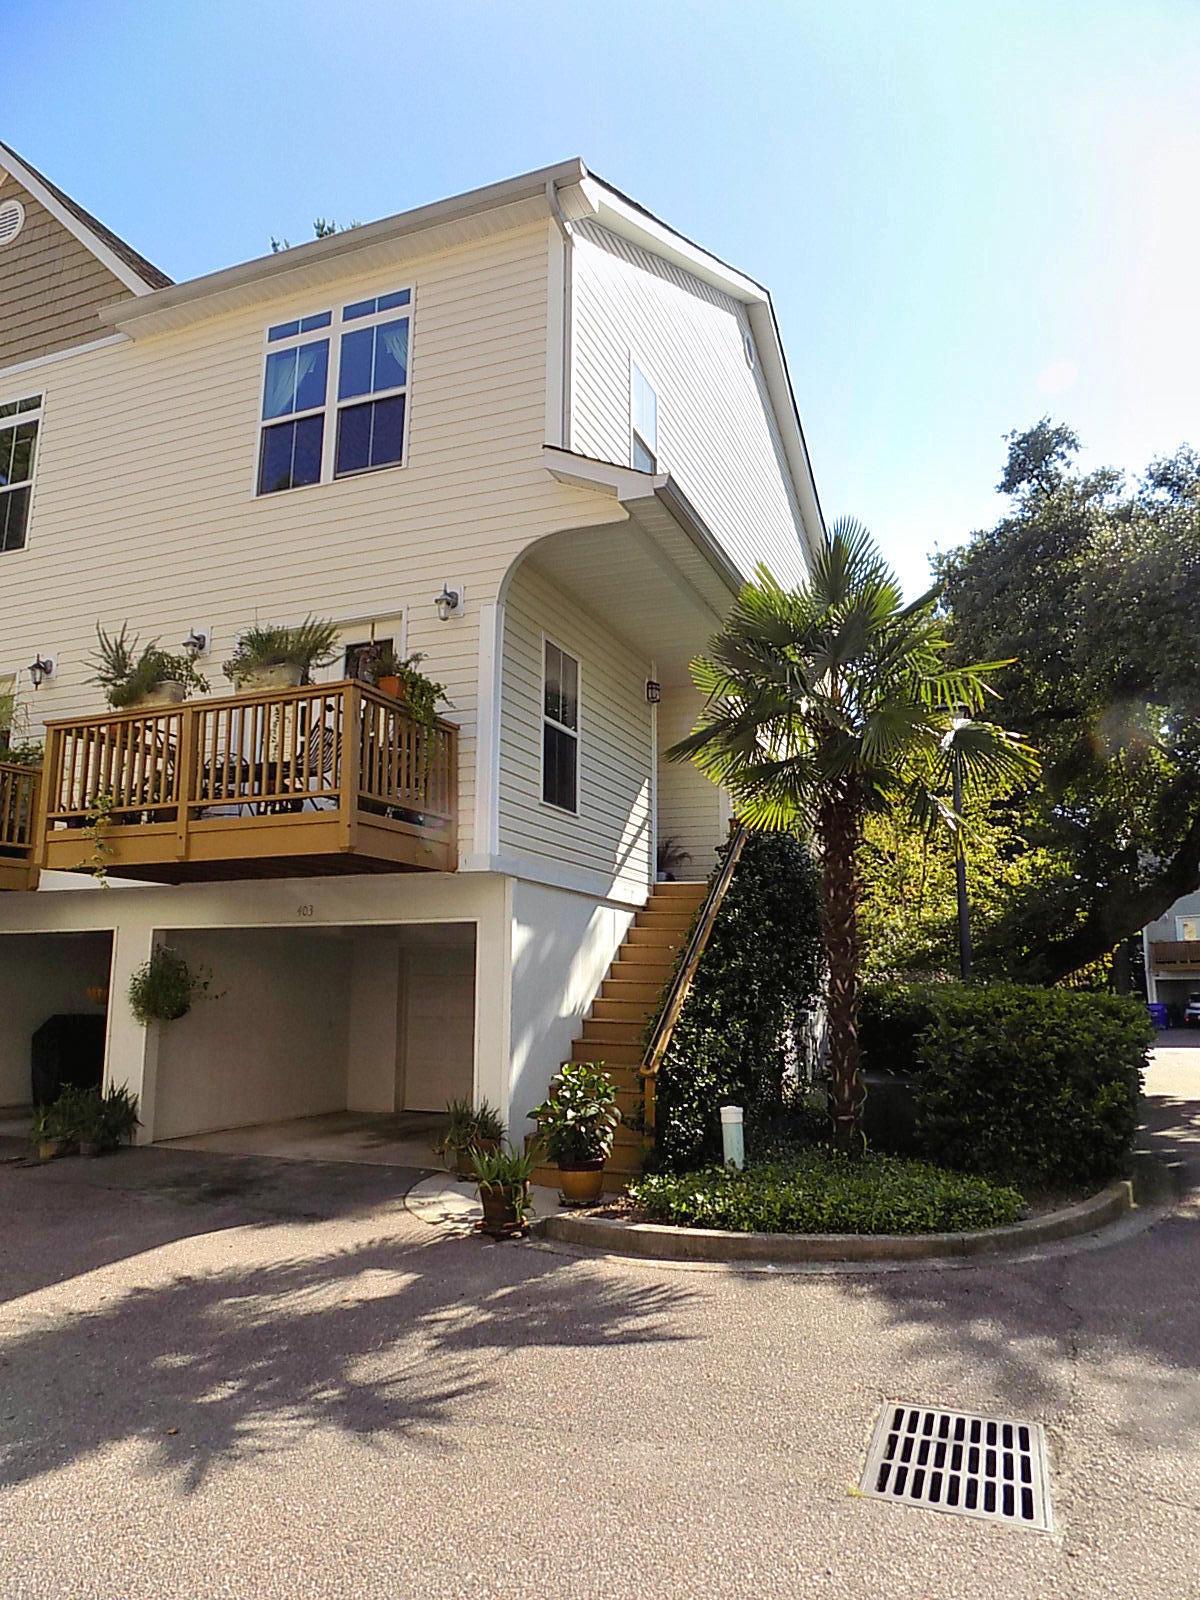 Willow Oaks Homes For Sale - 1829 Dogwood, Charleston, SC - 31